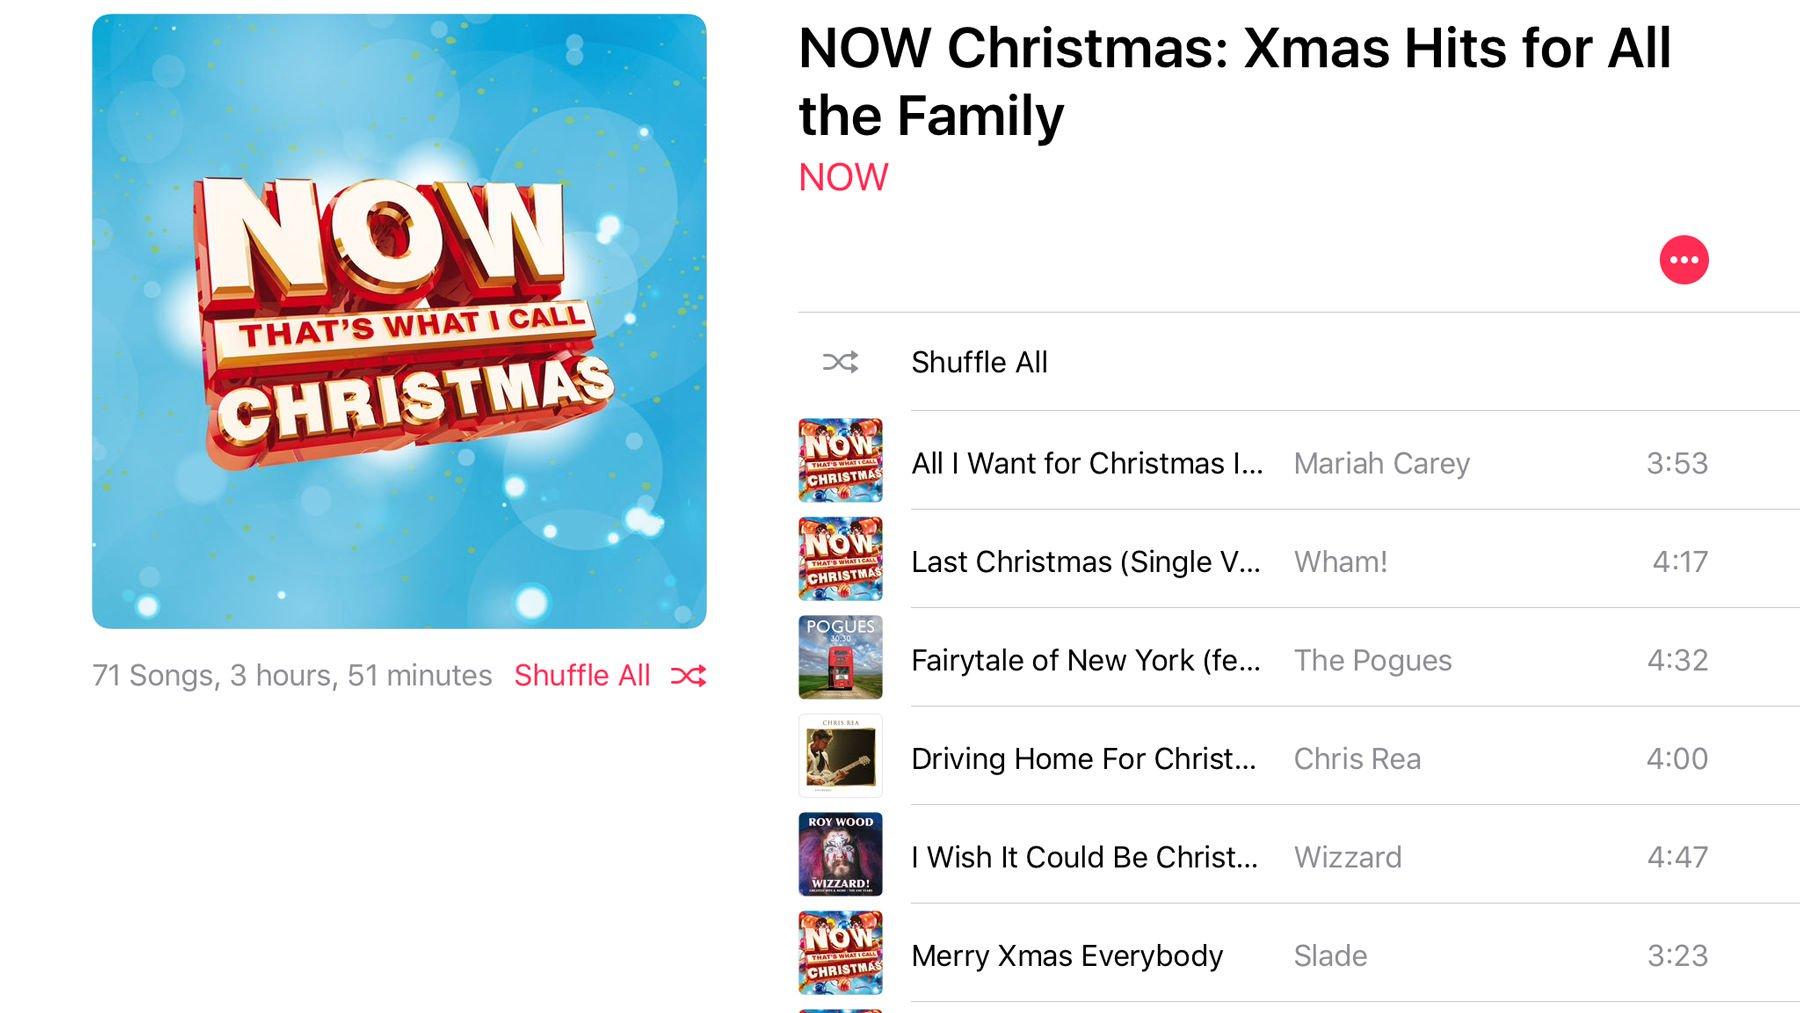 Best Christmas music on Apple Music: Now Christmas